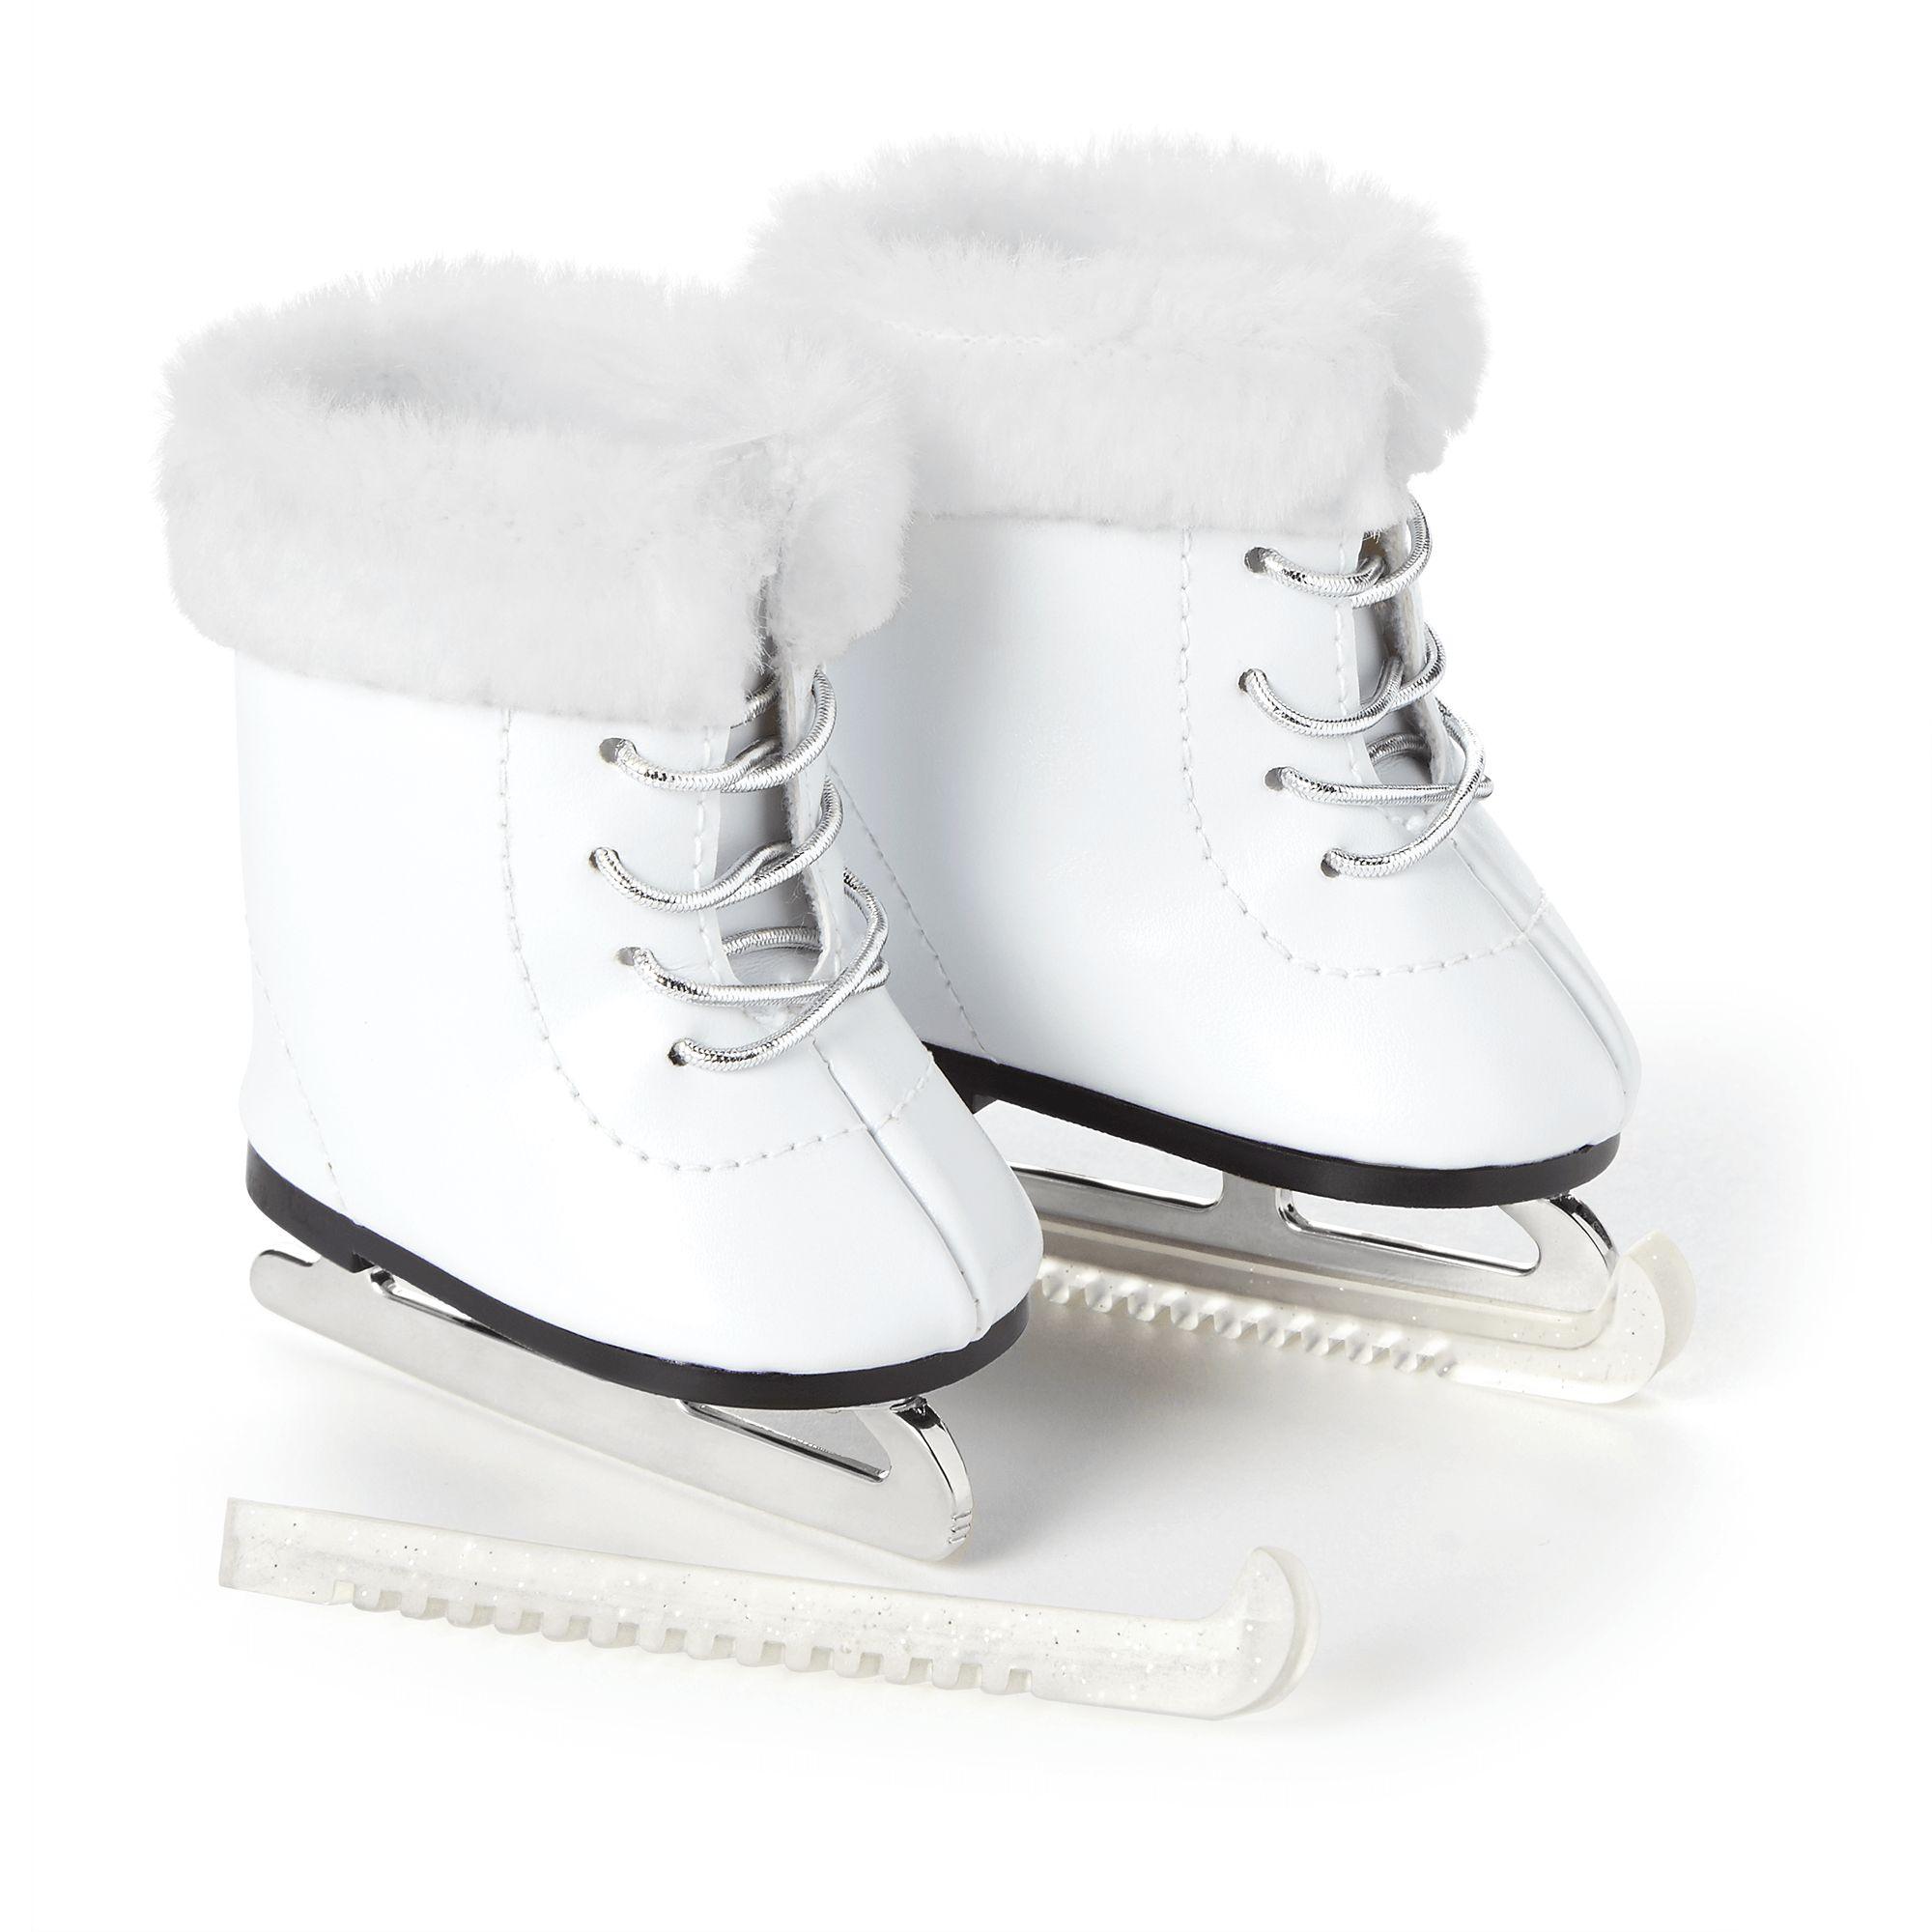 Snow Graceful Ice Skates